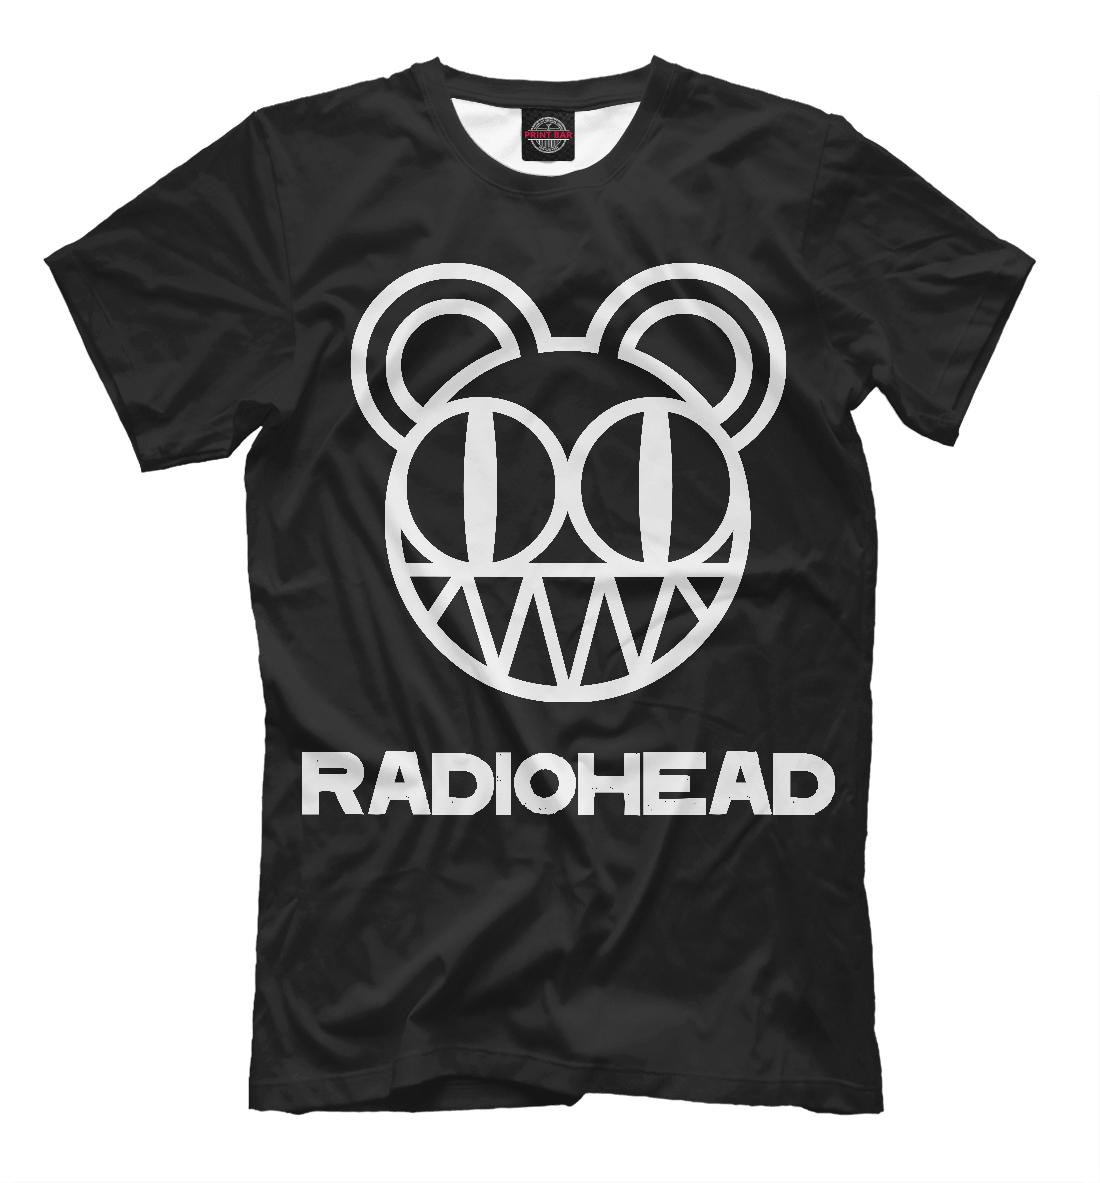 Купить Radiohead, Printbar, Футболки, MZK-692916-fut-2